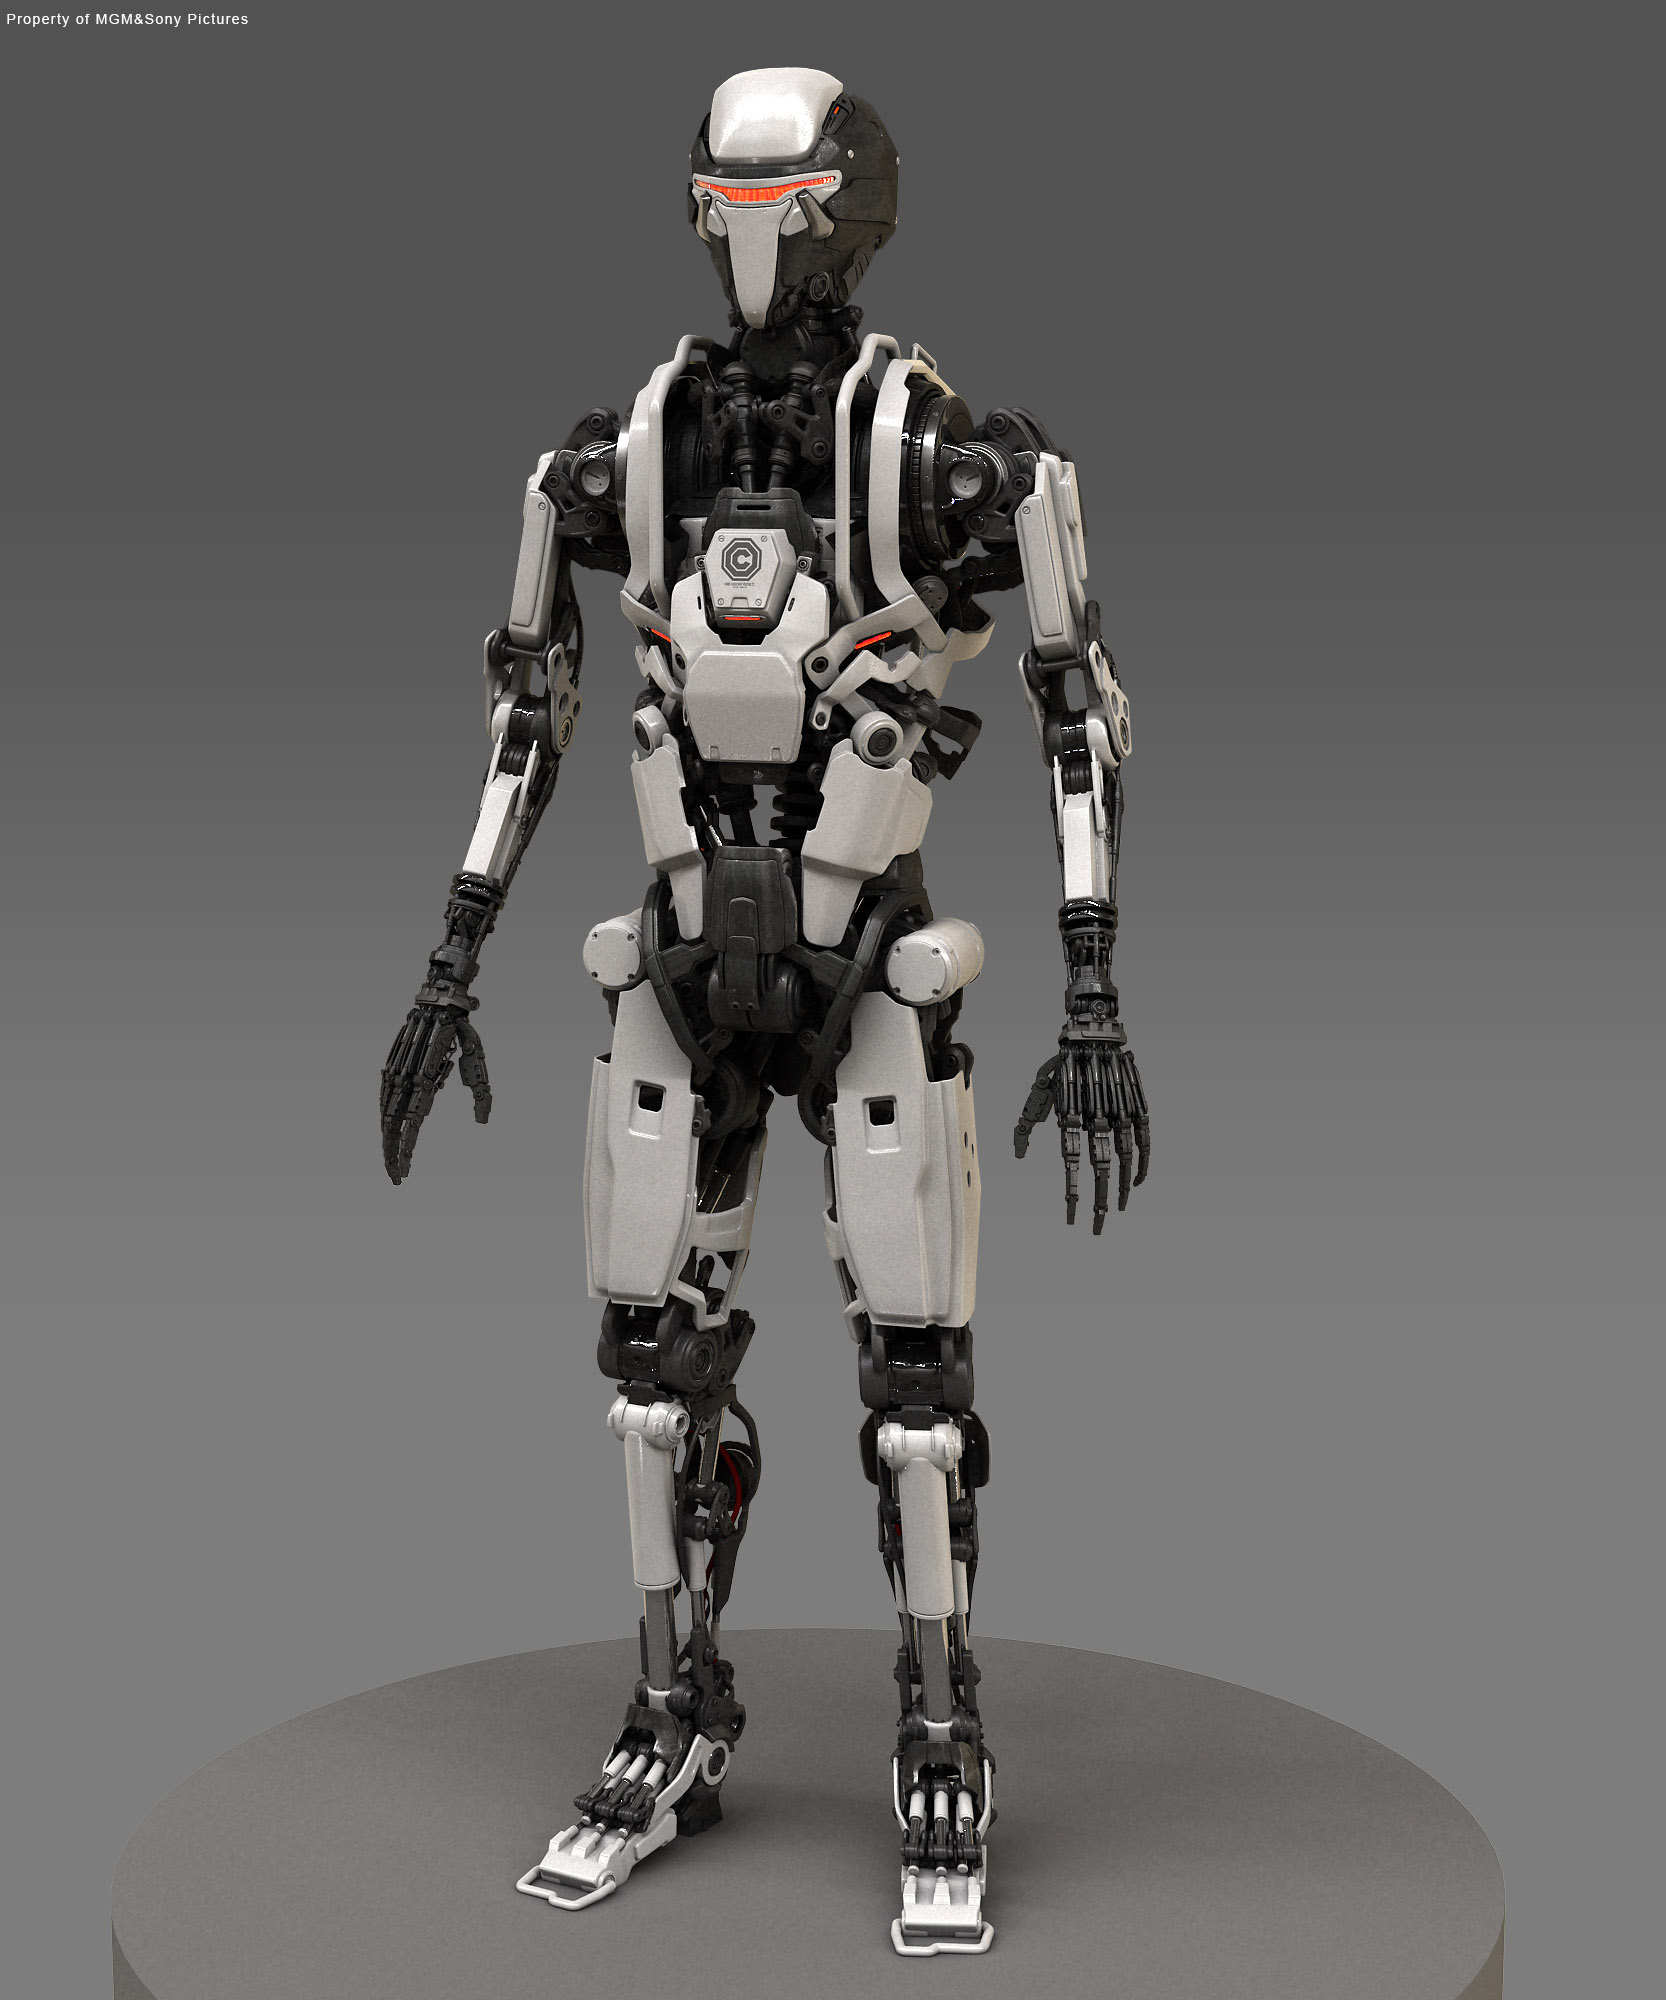 Robocop_Illustration_EB207_V01_White_FDeMartini_020234.jpg